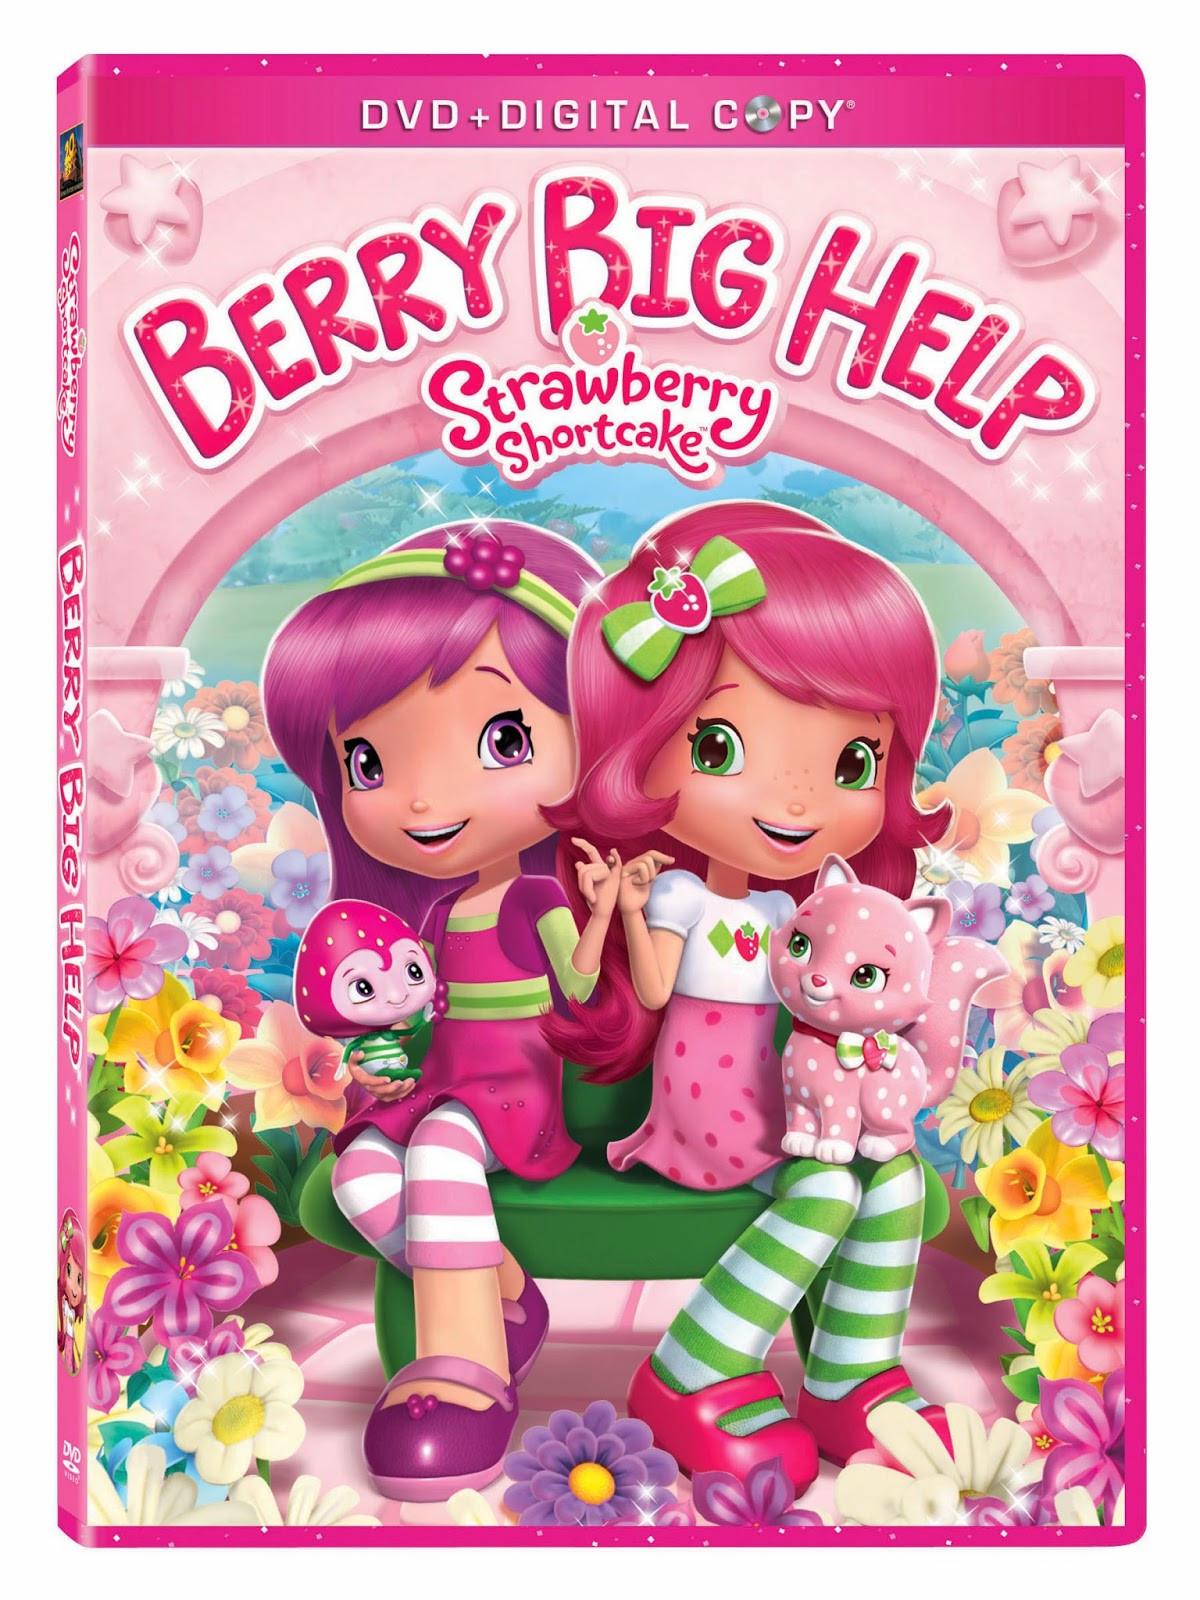 Strawberry Shortcake Dvds  SoCal Kids Outdoor Adventures Strawberry Shortcake Berry